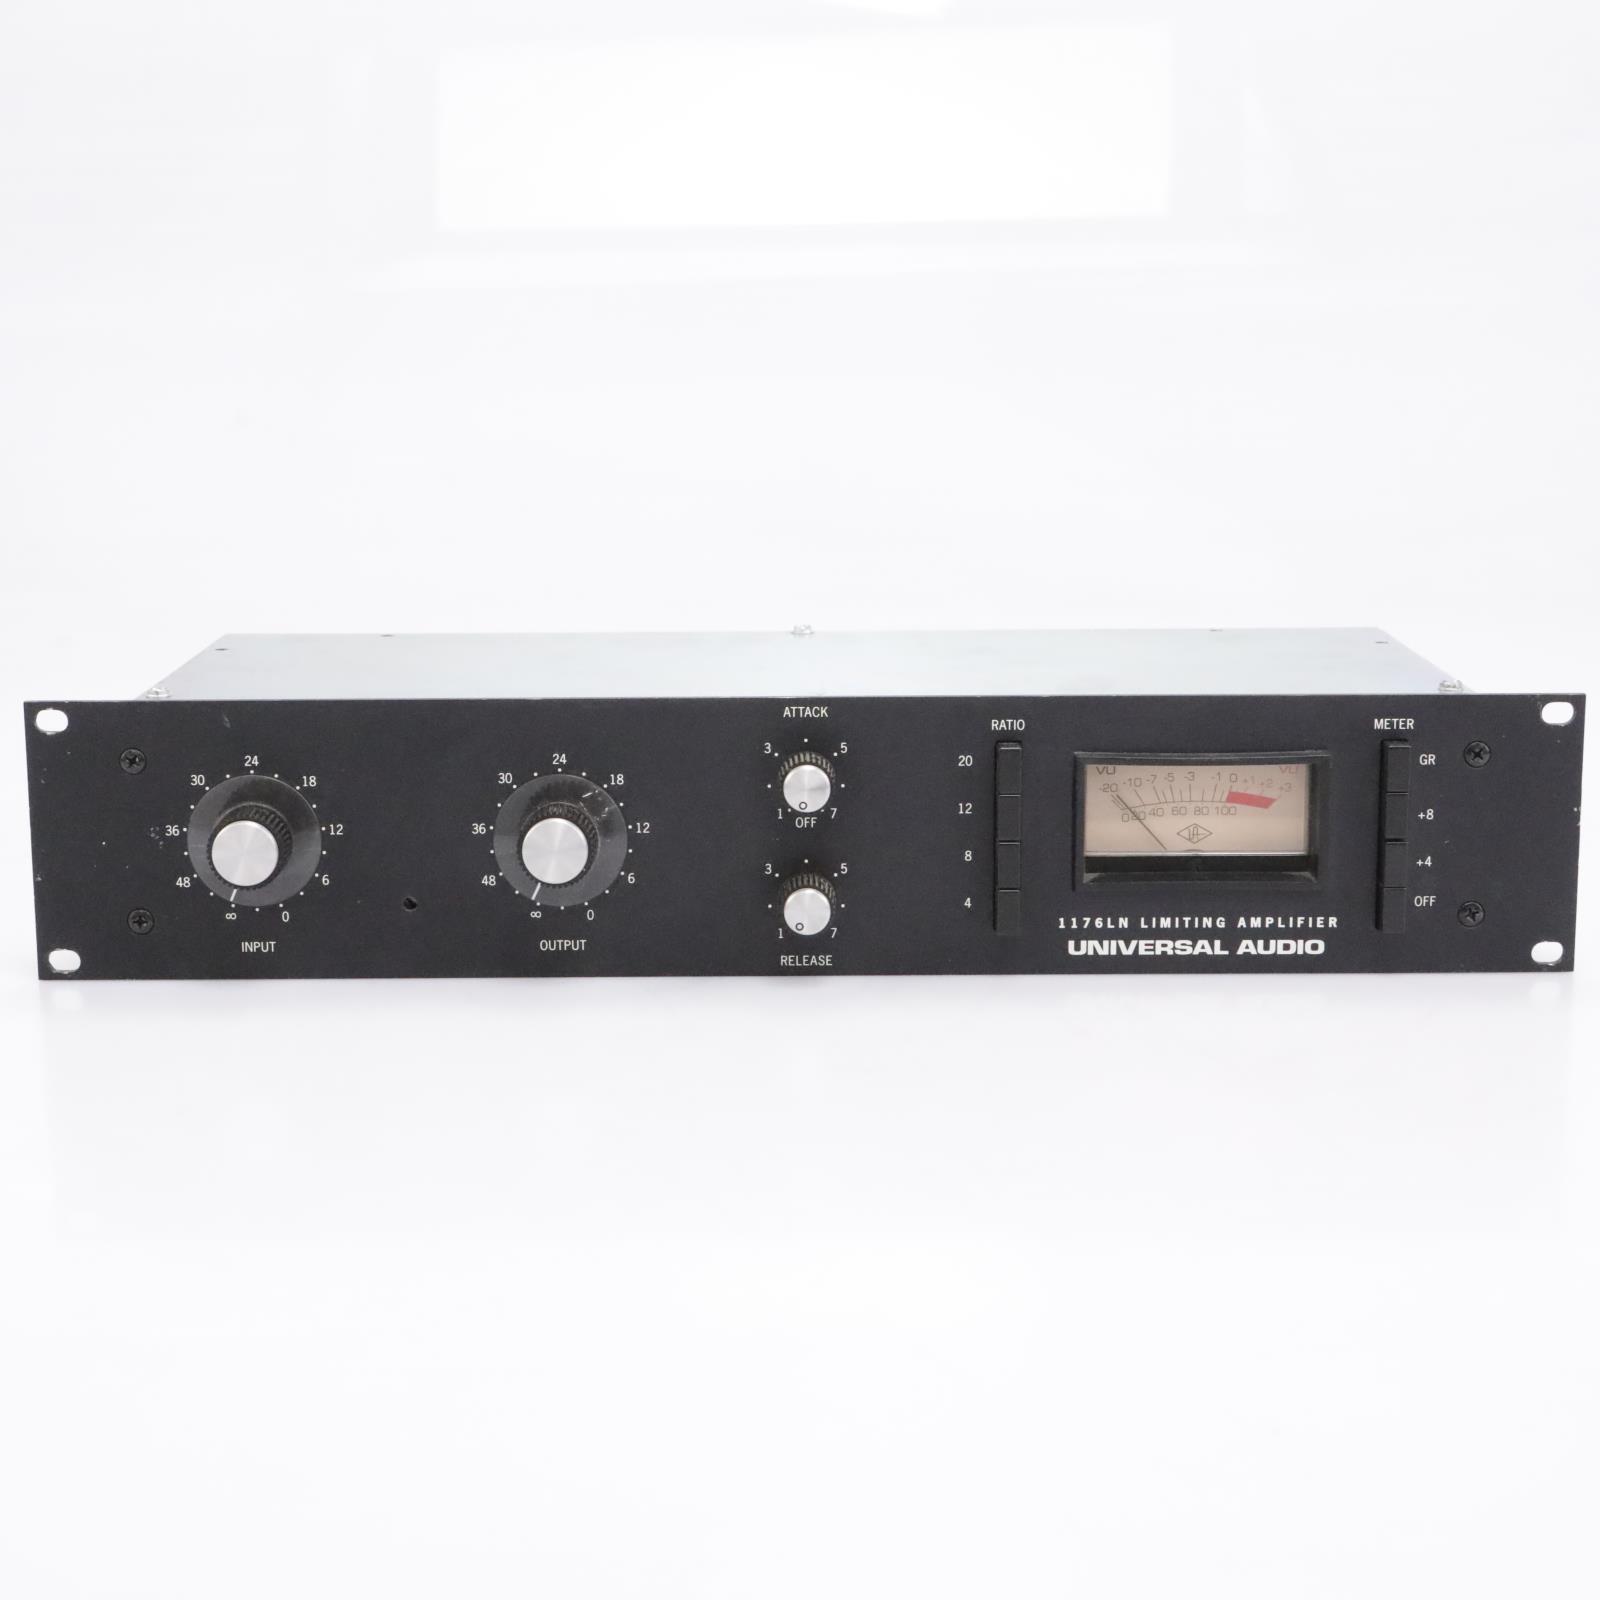 2000 Universal Audio 1176LN Solid State Peak Limiter 1st Reissue #43552